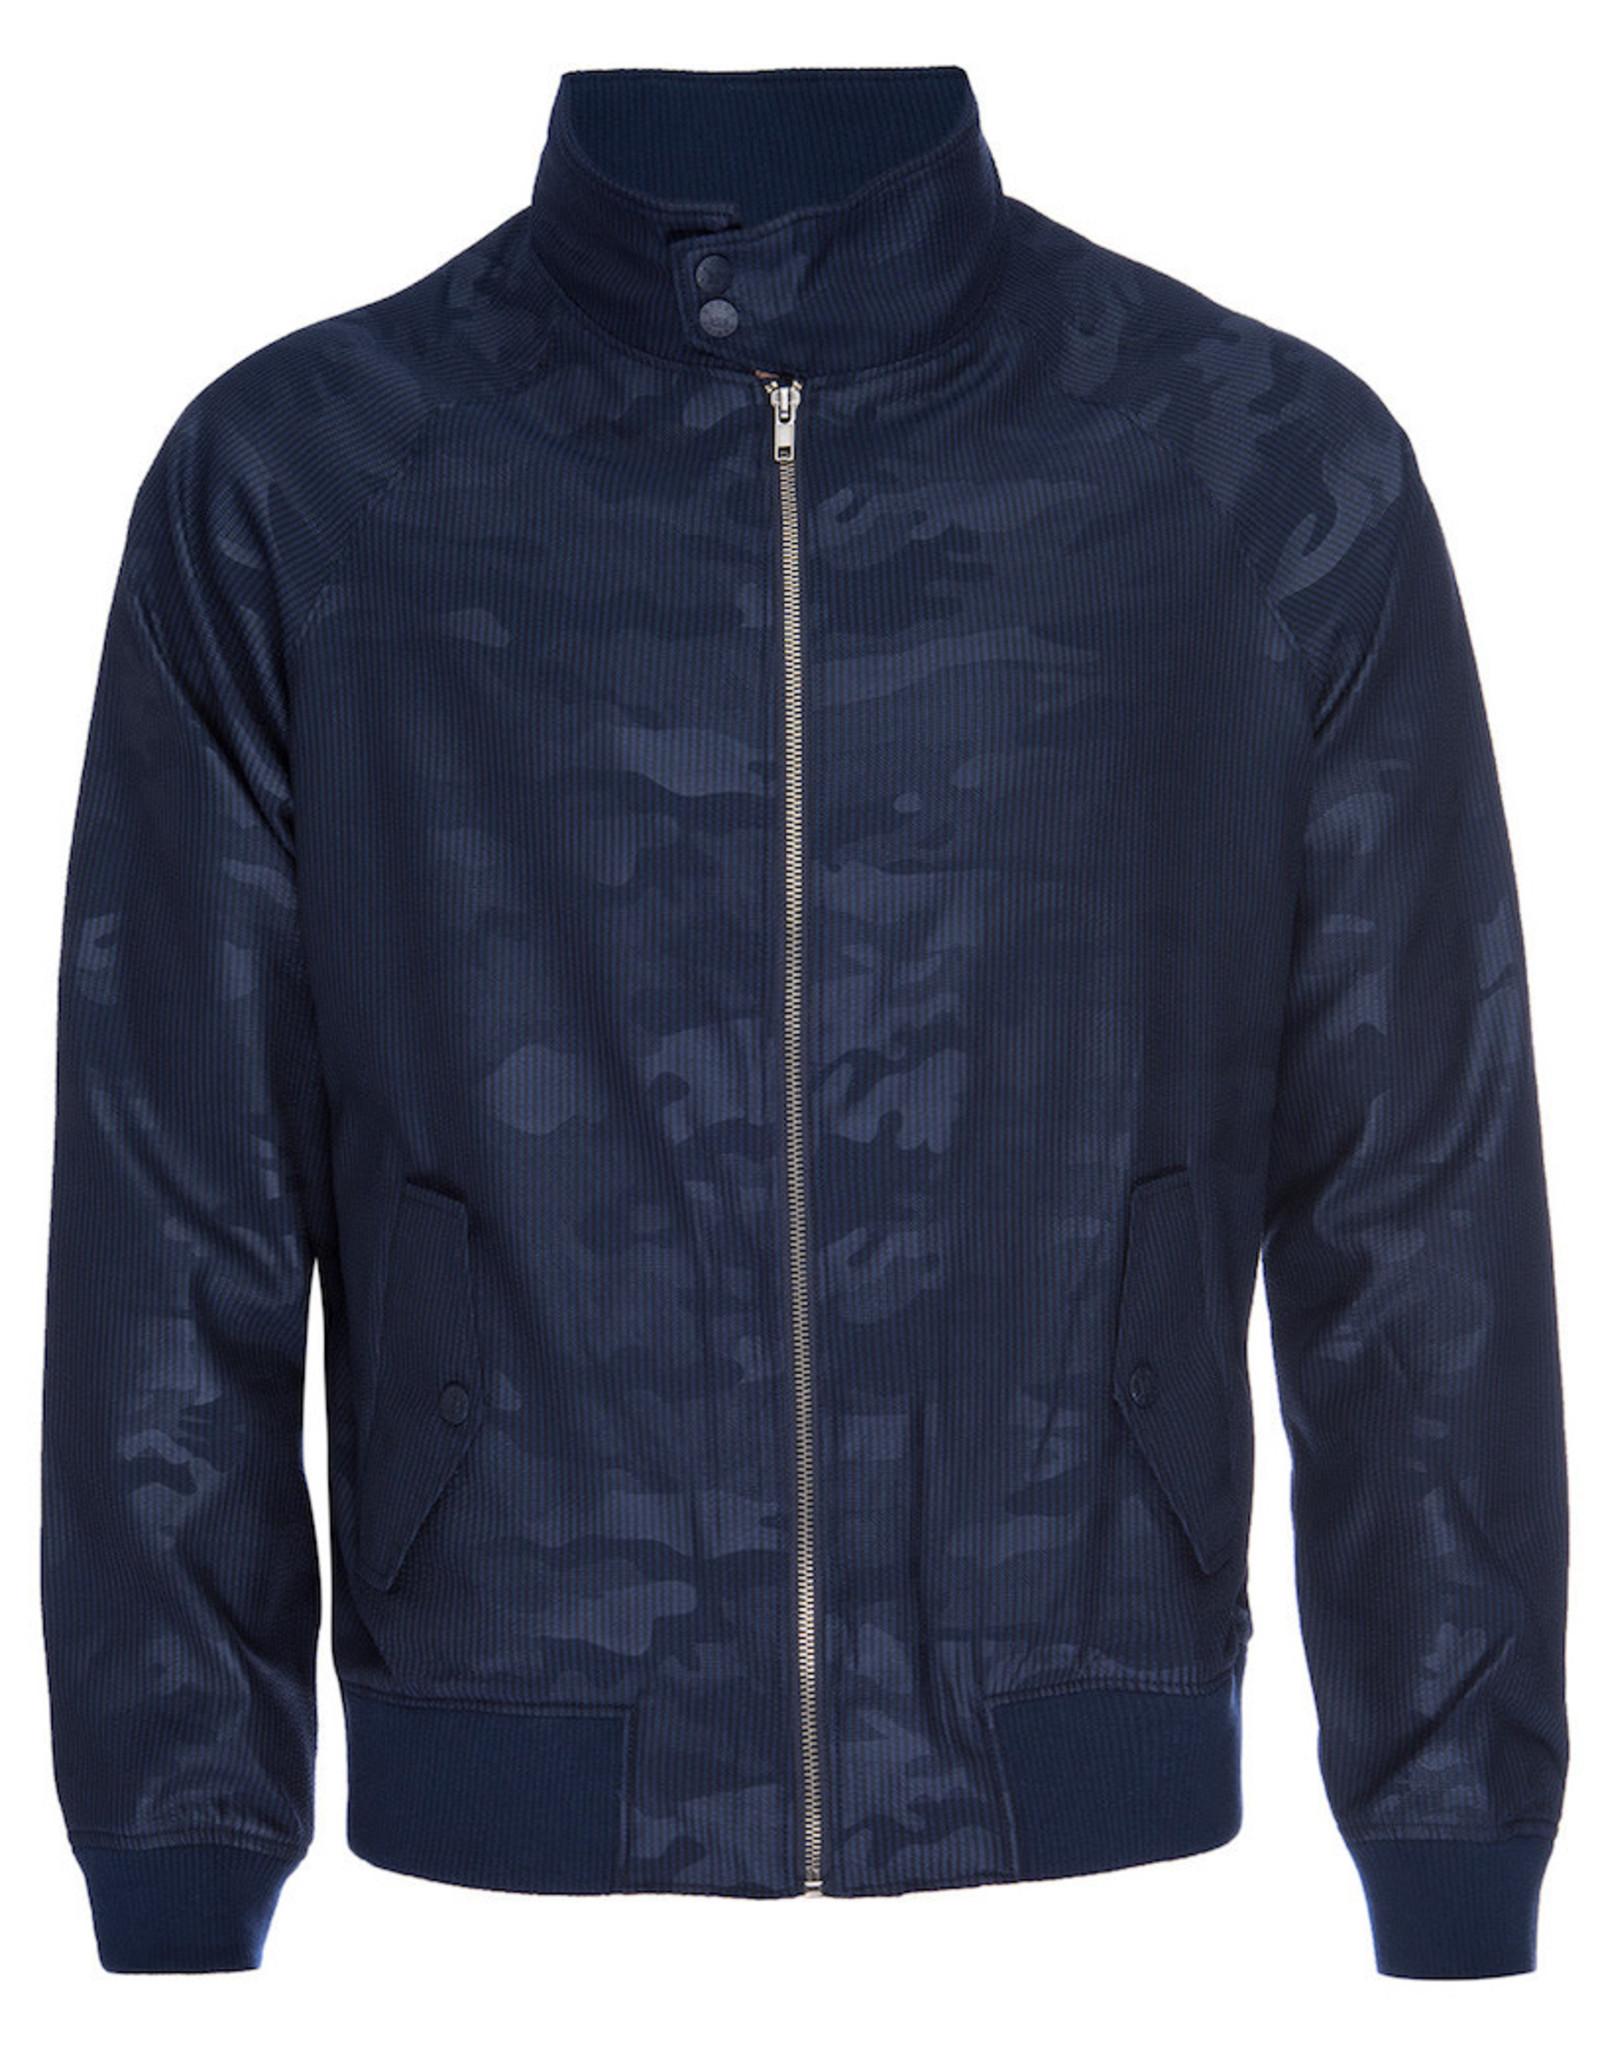 Nifty Genius Harrington Jacket